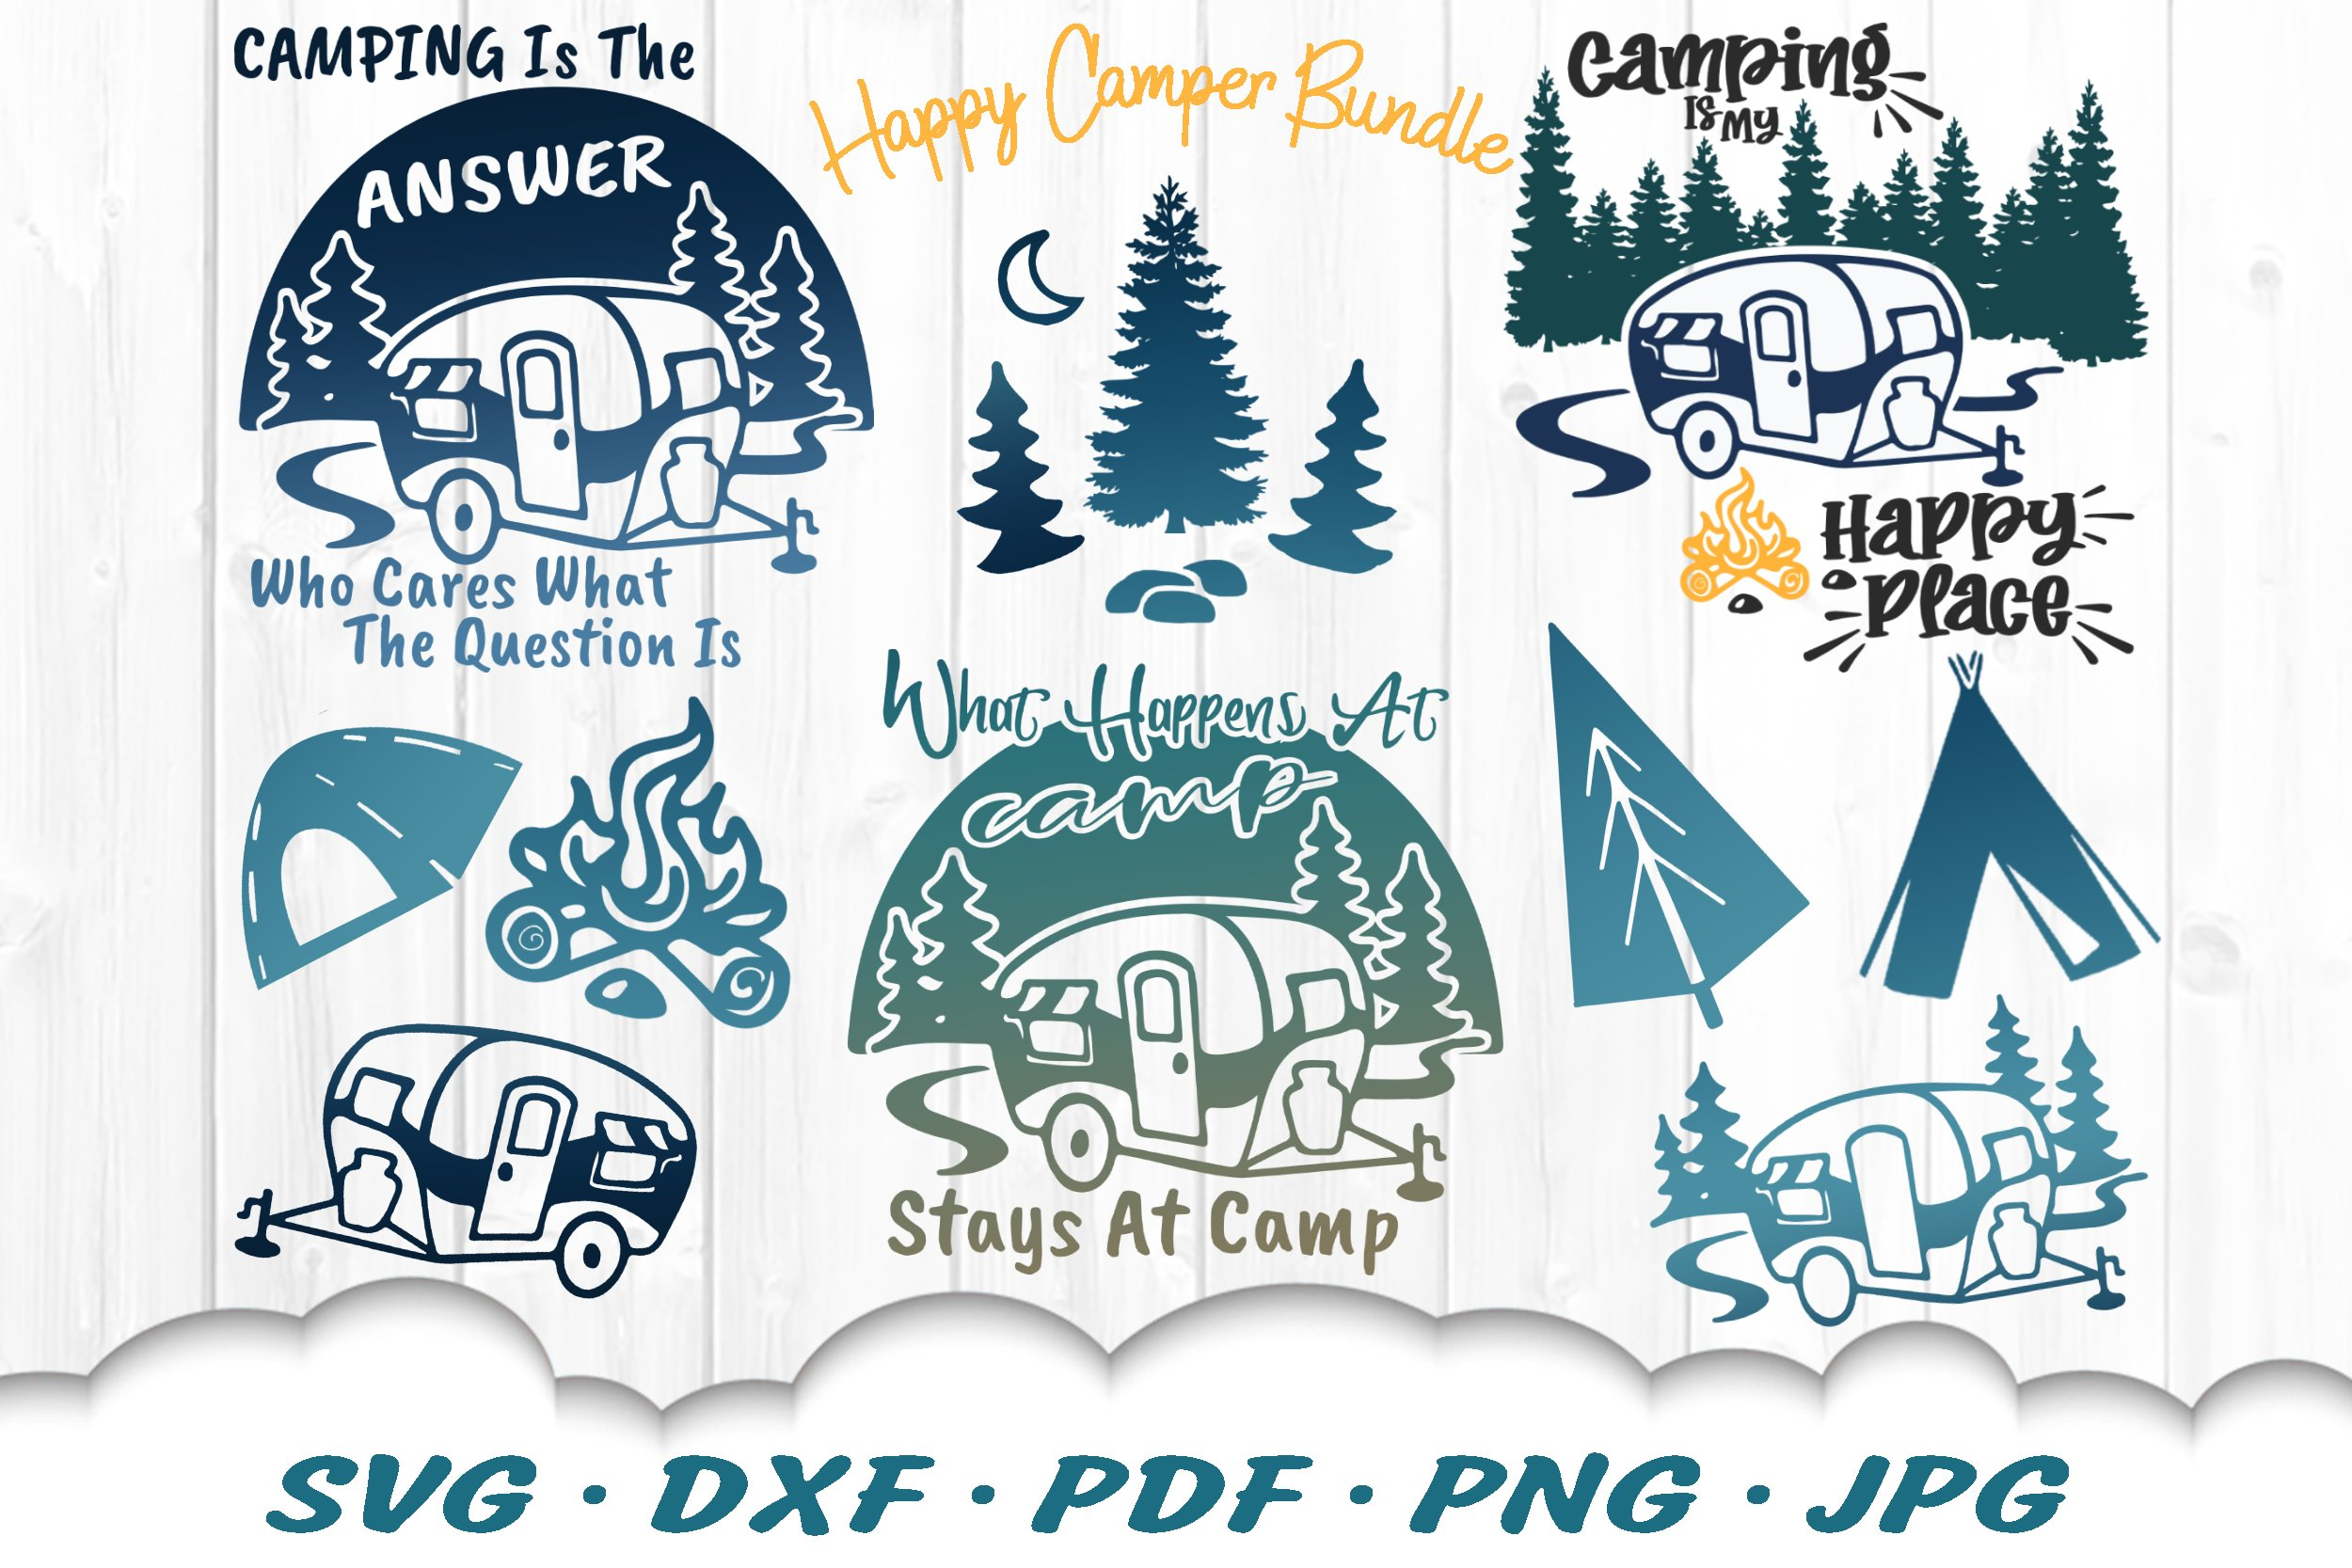 Happy Camper Svg Bundle Camping Svg Dxf Cut Files 668302 Cut Files Design Bundles